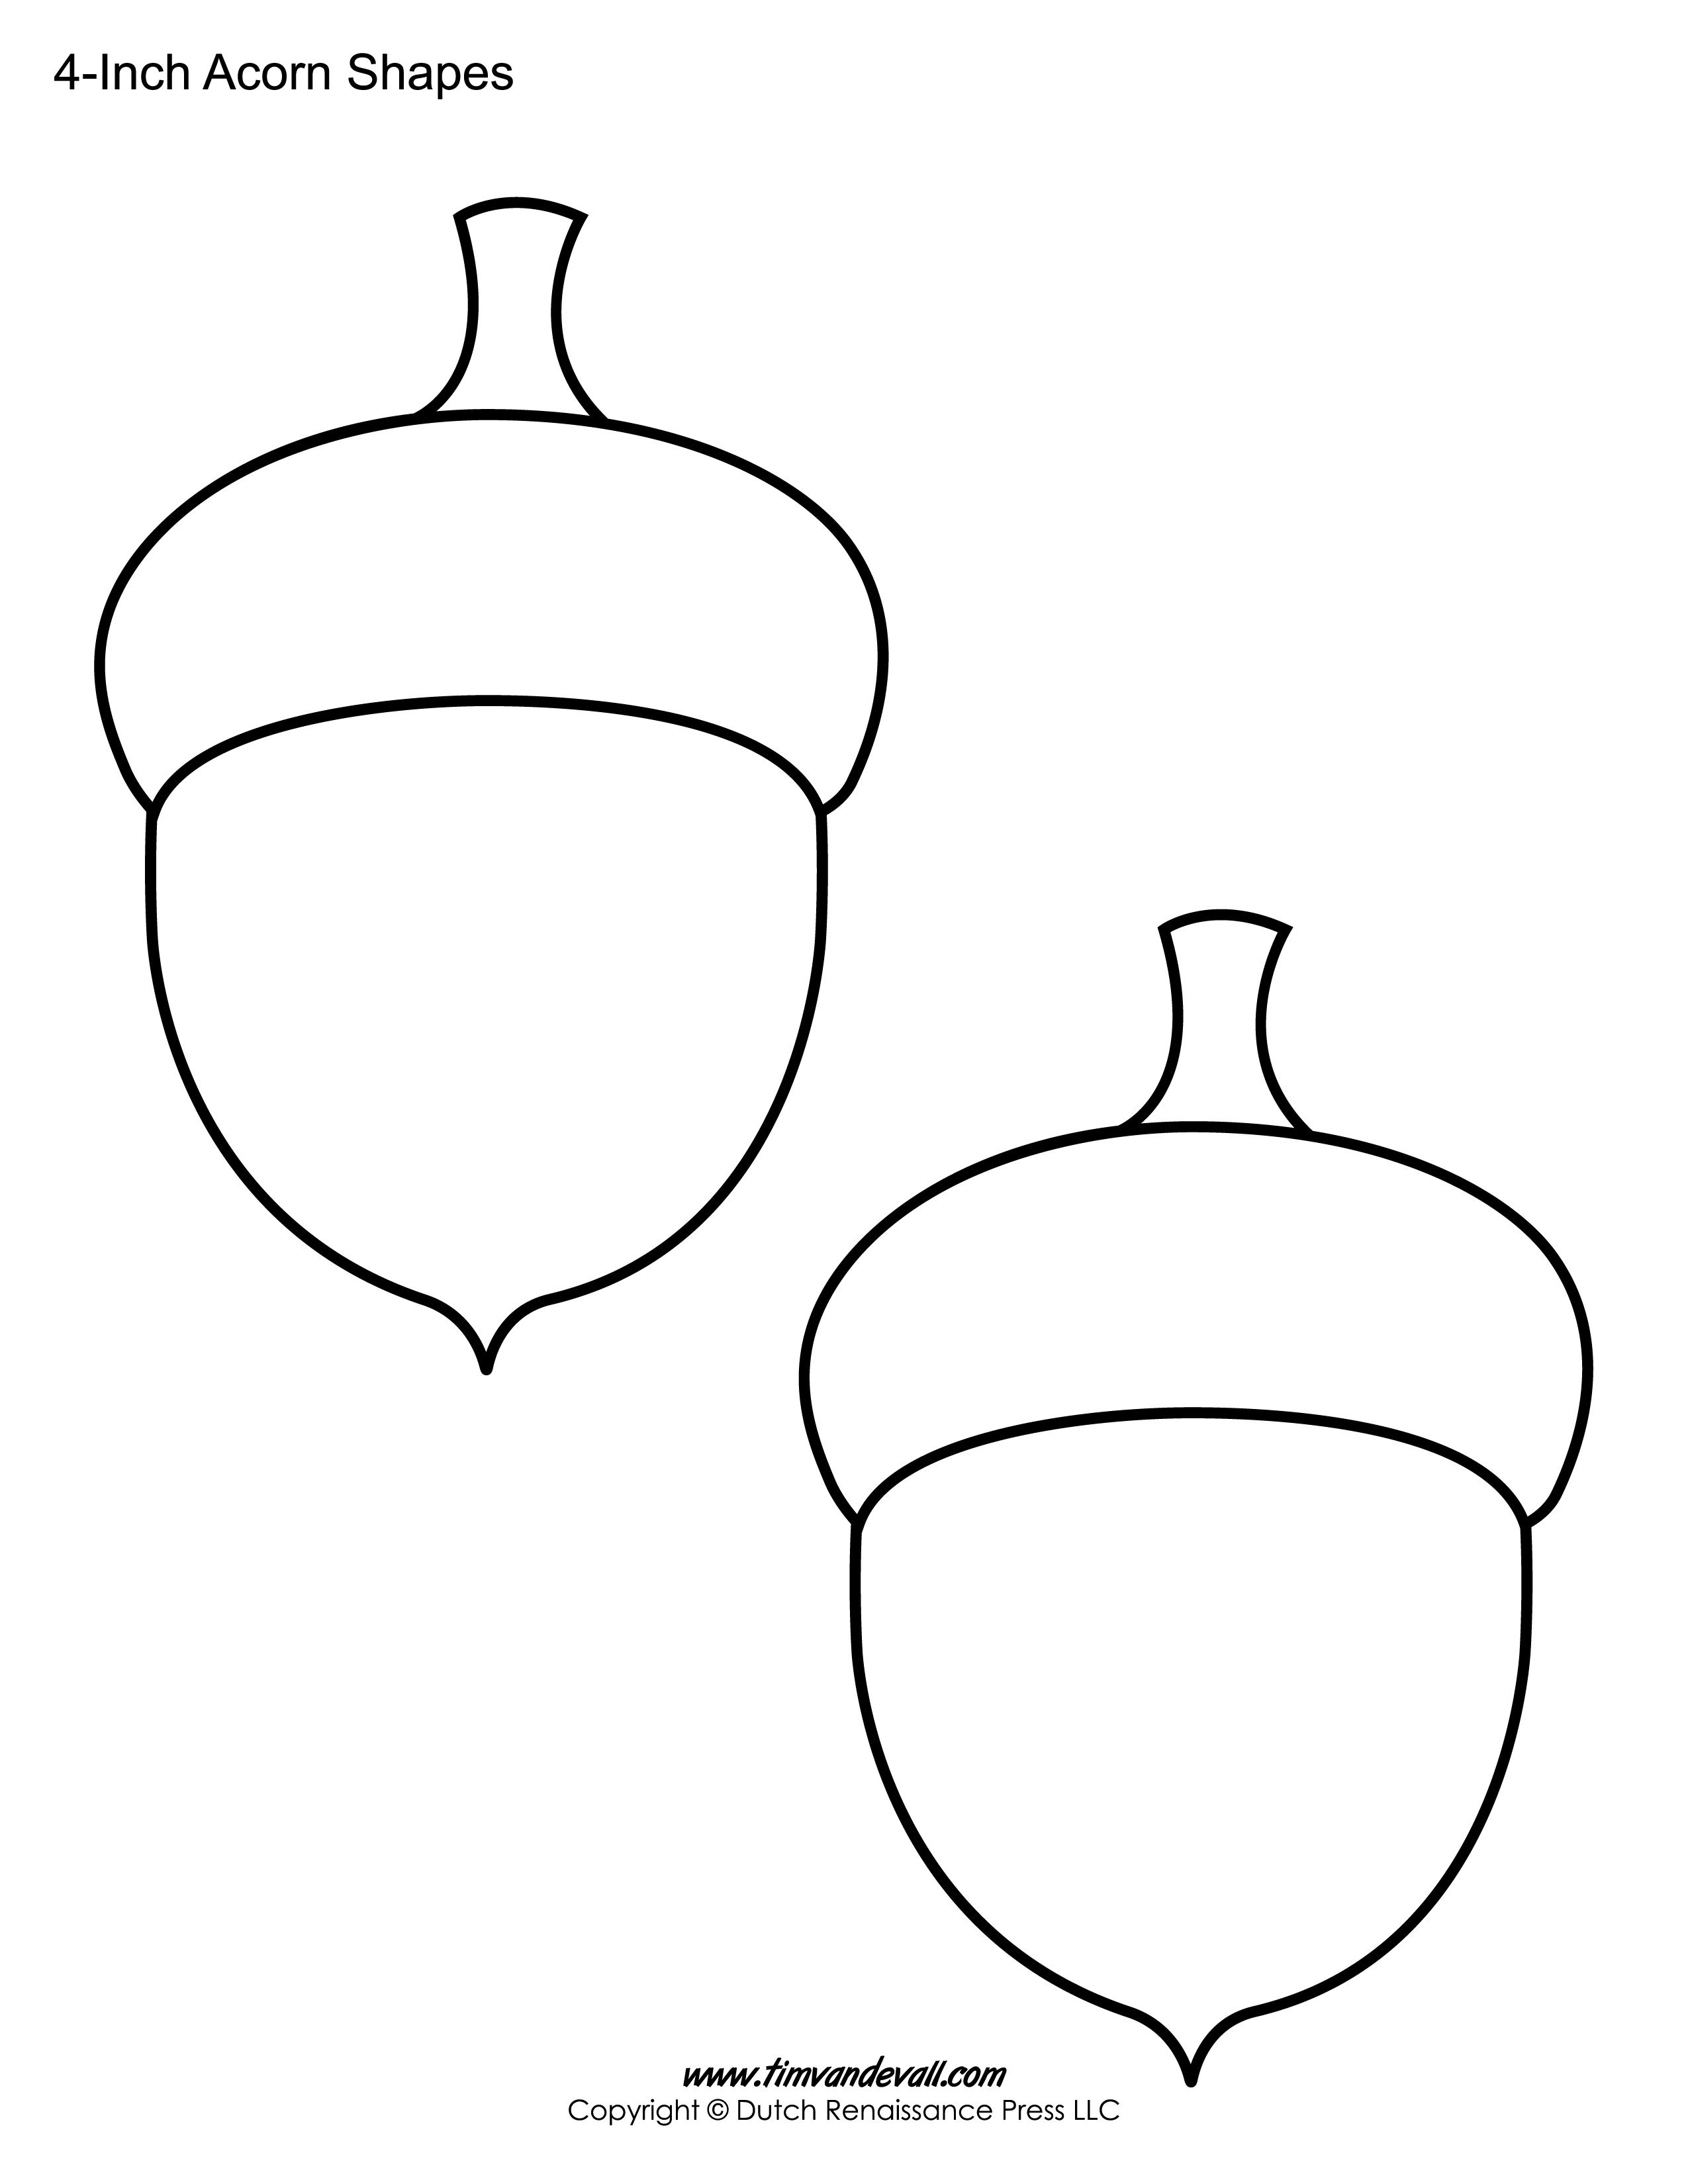 Acorn Printable Sheet   Templates   Fall Crafts, Applique Templates - Pumpkin Shape Template Printable Free